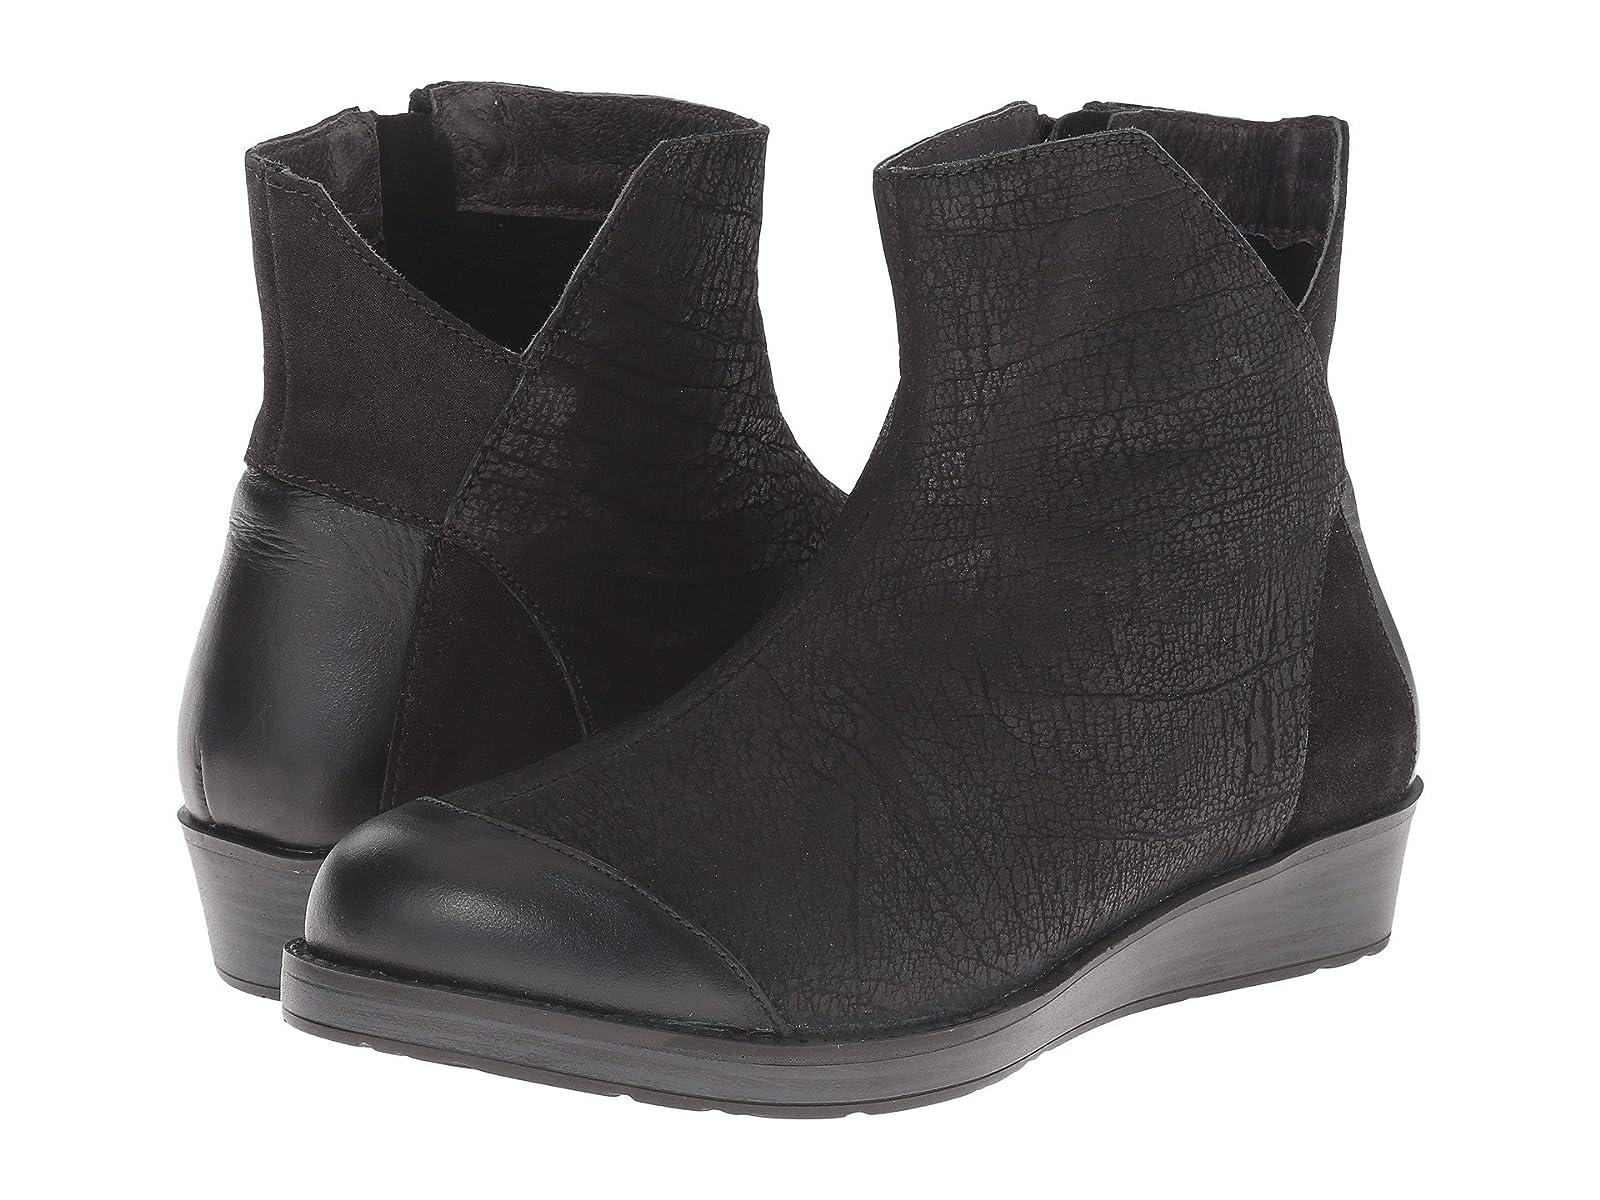 Naot LoyalCheap and distinctive eye-catching shoes